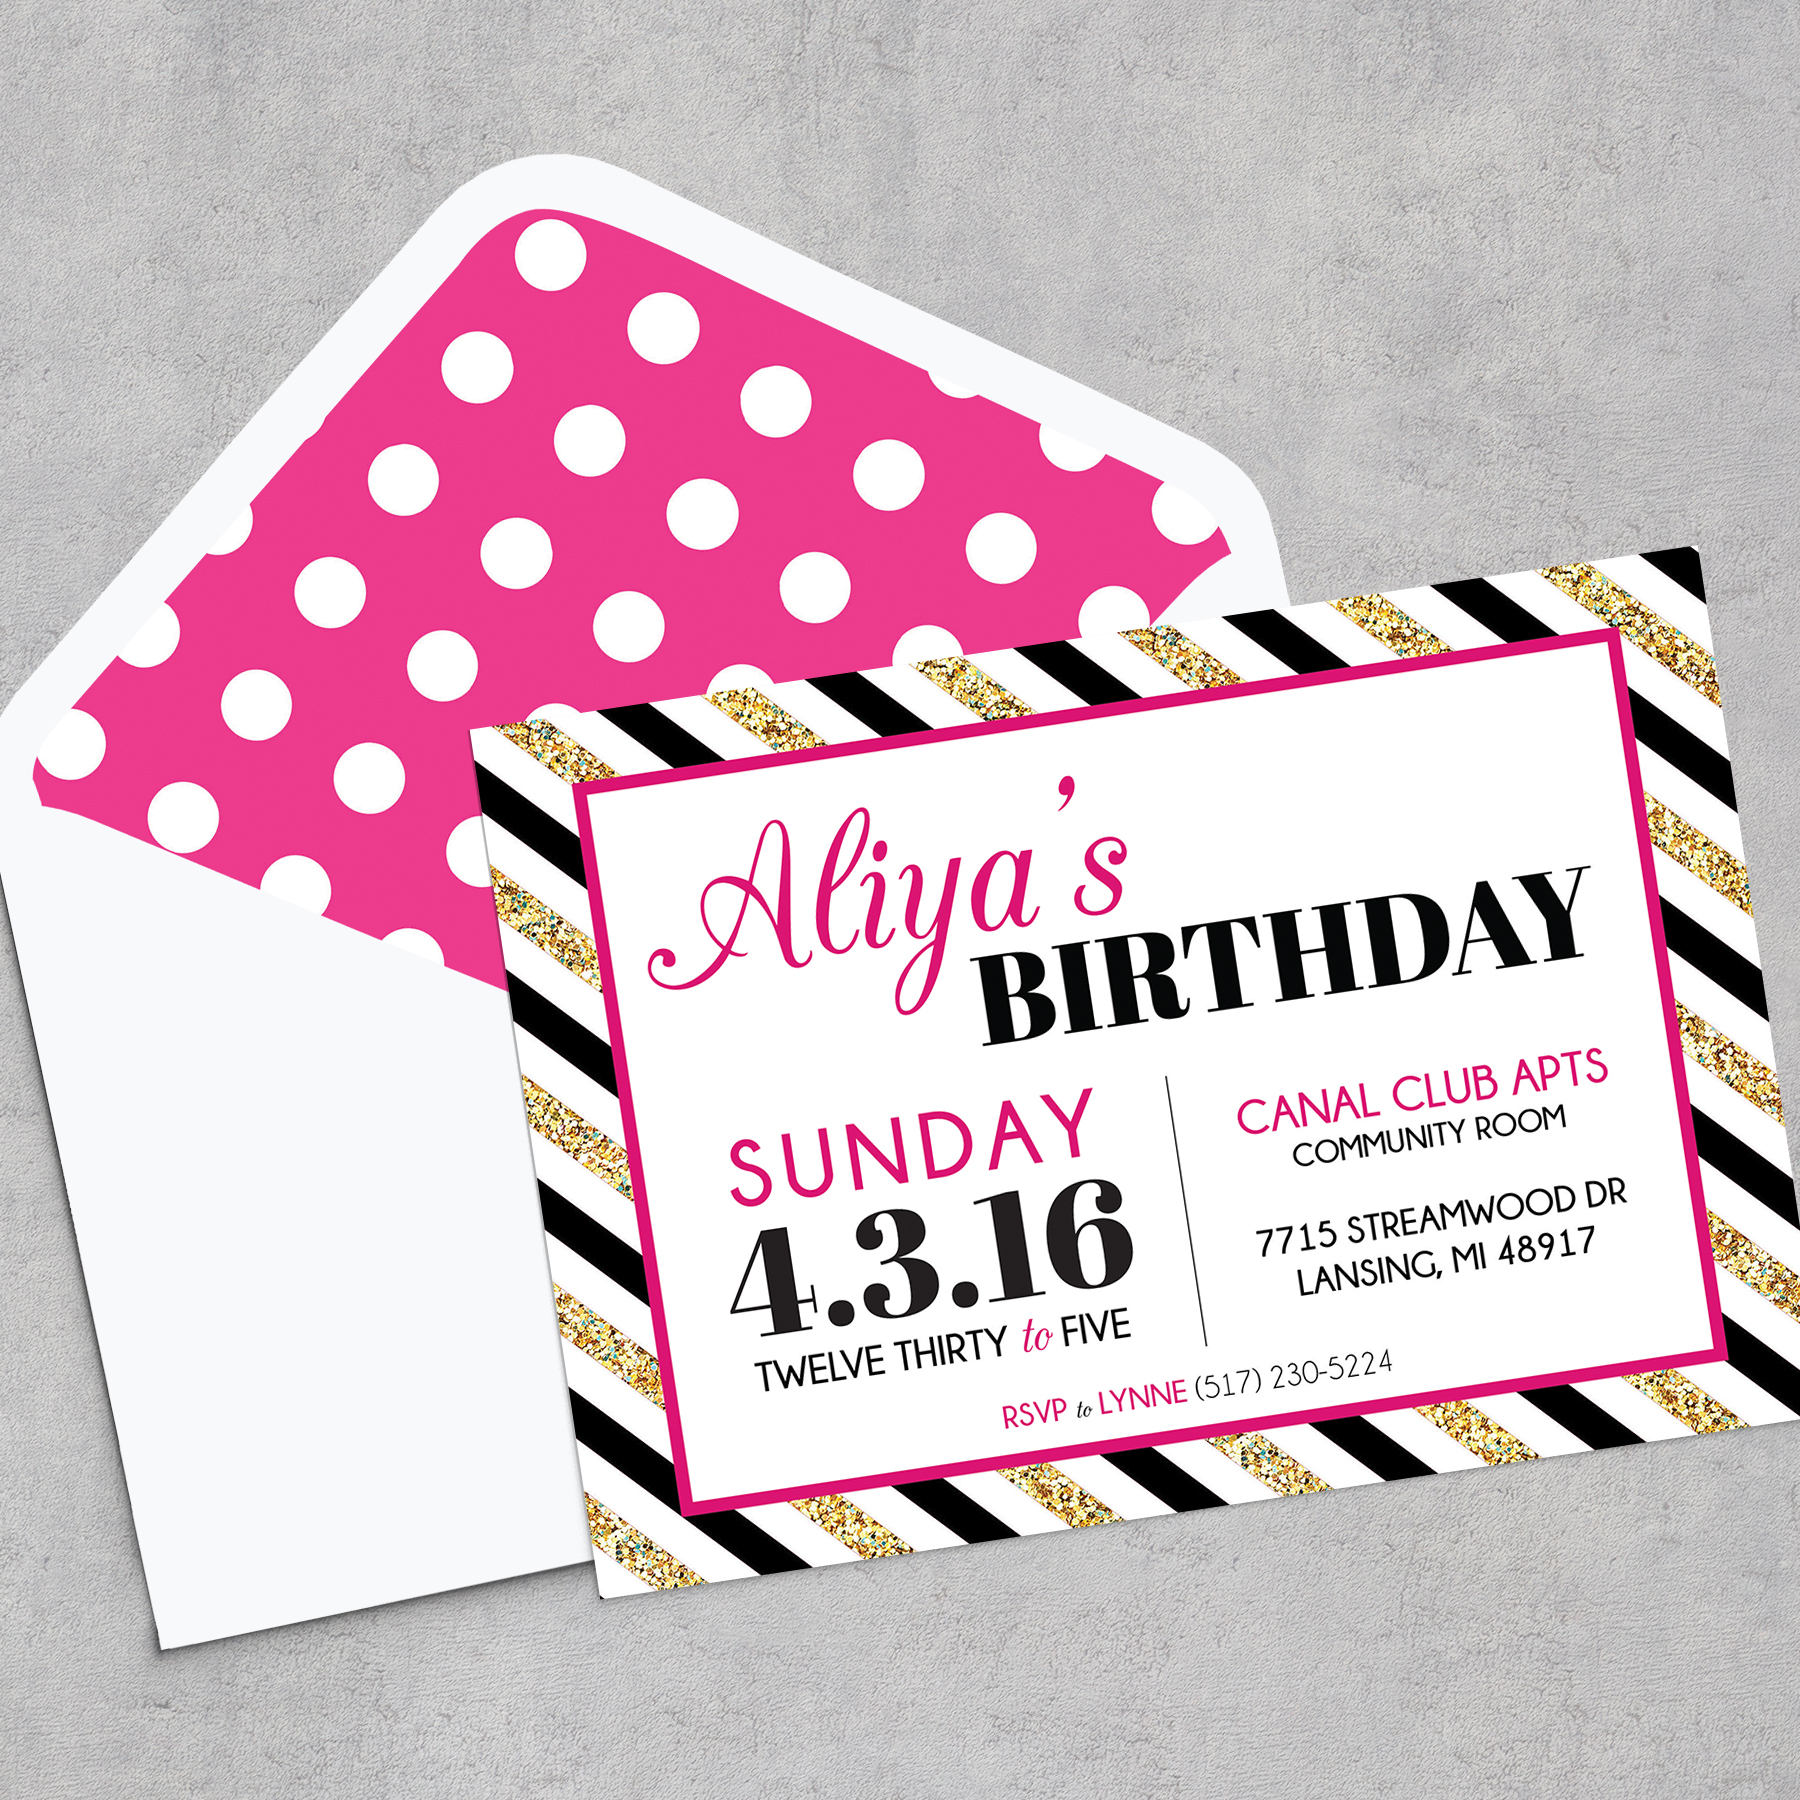 Modern Glam Inspired Birthday Party